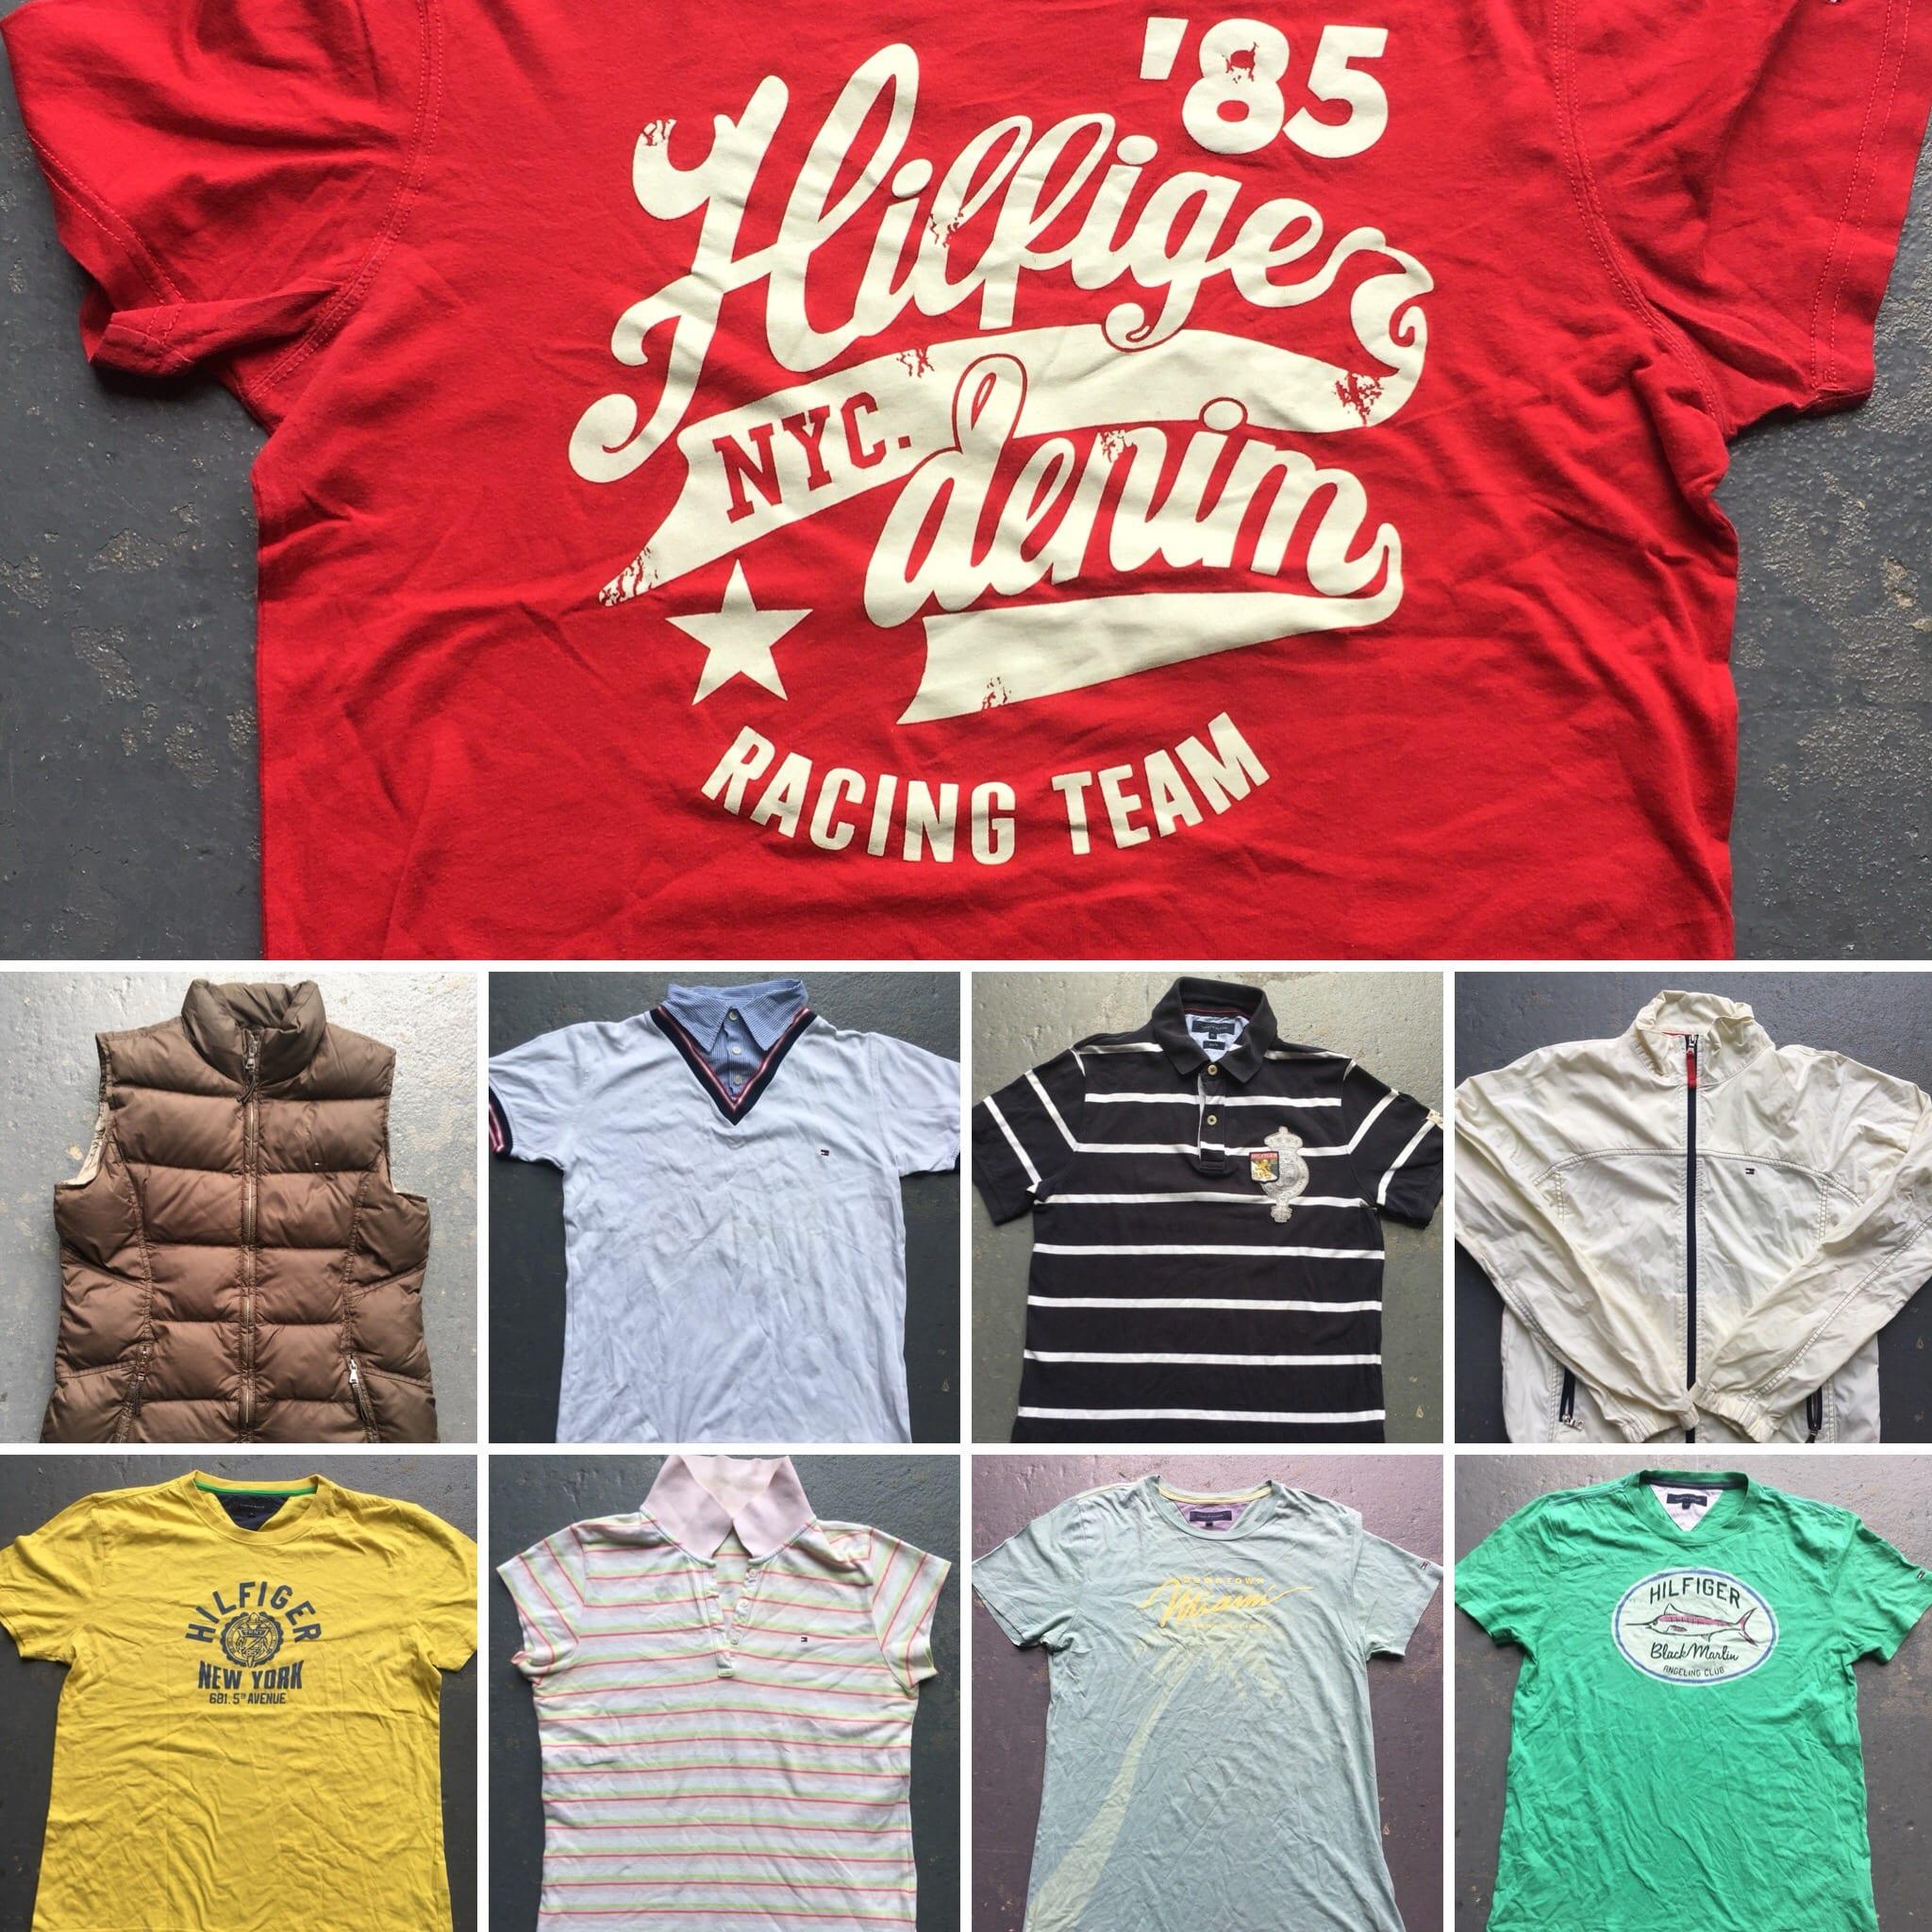 041c96b9 vintage clothing, vintage clothes hull and uk, buy per kilo vintage clothing